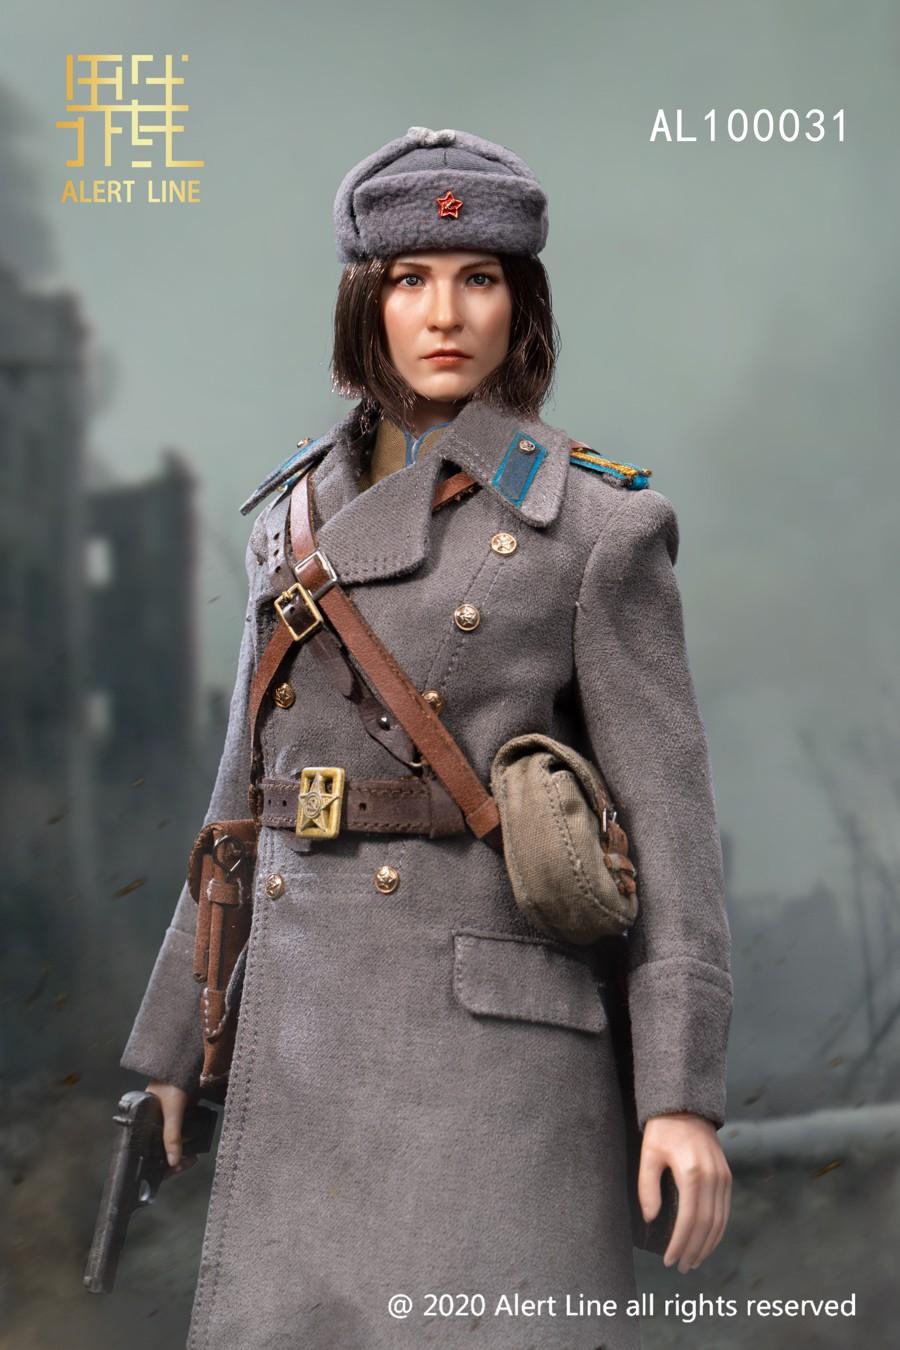 alertline - NEW PRODUCT: Alert Line Boundary Game Model: 1/6 WWII Soviet Army Female Soldier NKVD, Soviet Army Female Medical Soldier #AL100031/32 Price announced Alert_10